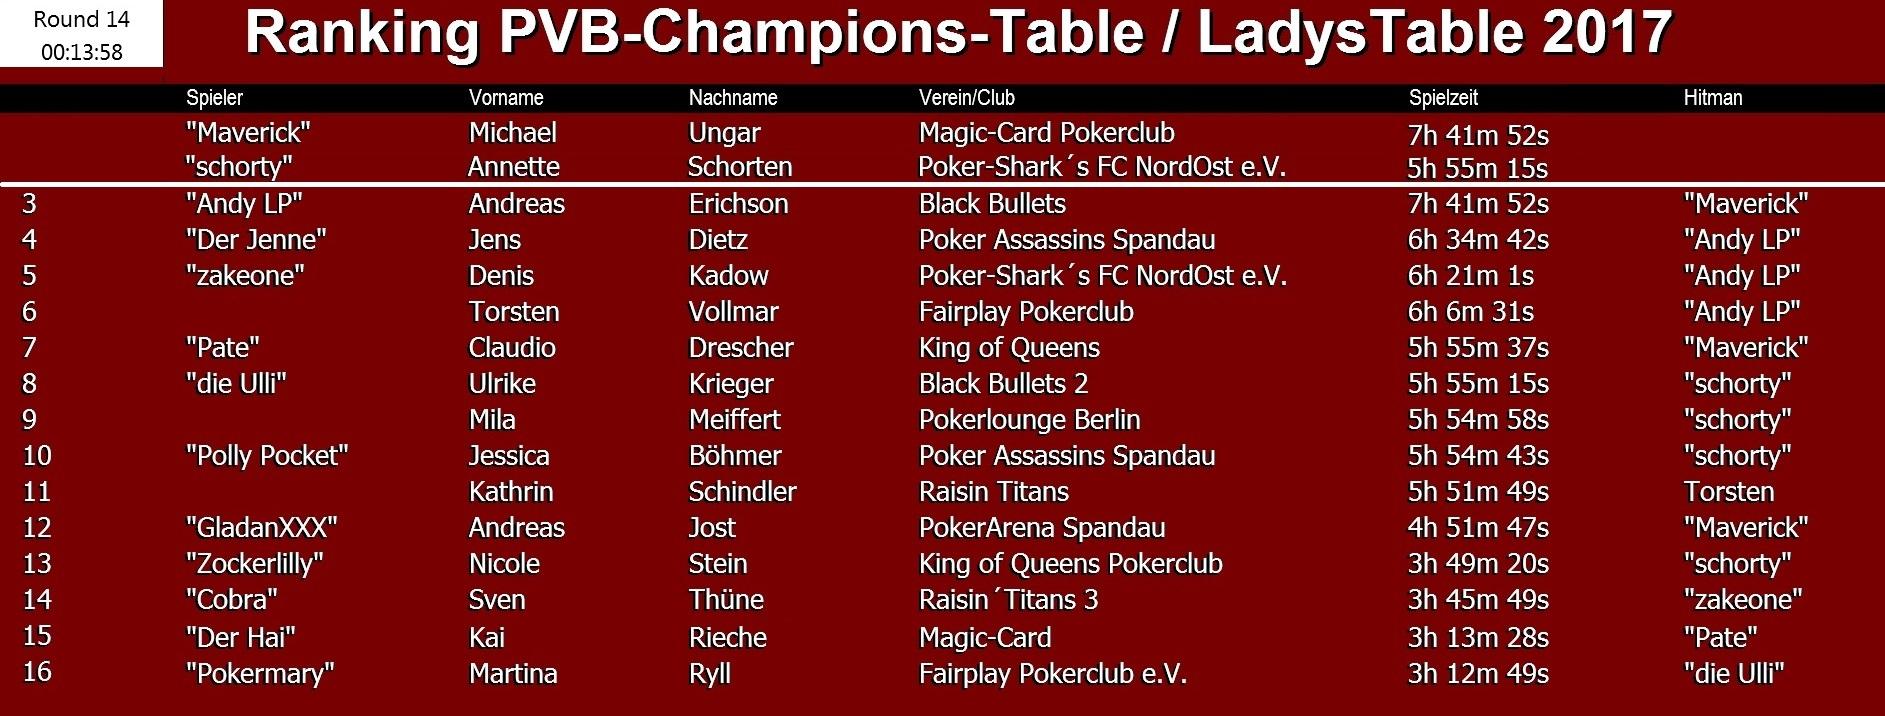 ChampionsTable und LadysTable 2017 des PVB / Das Ranking